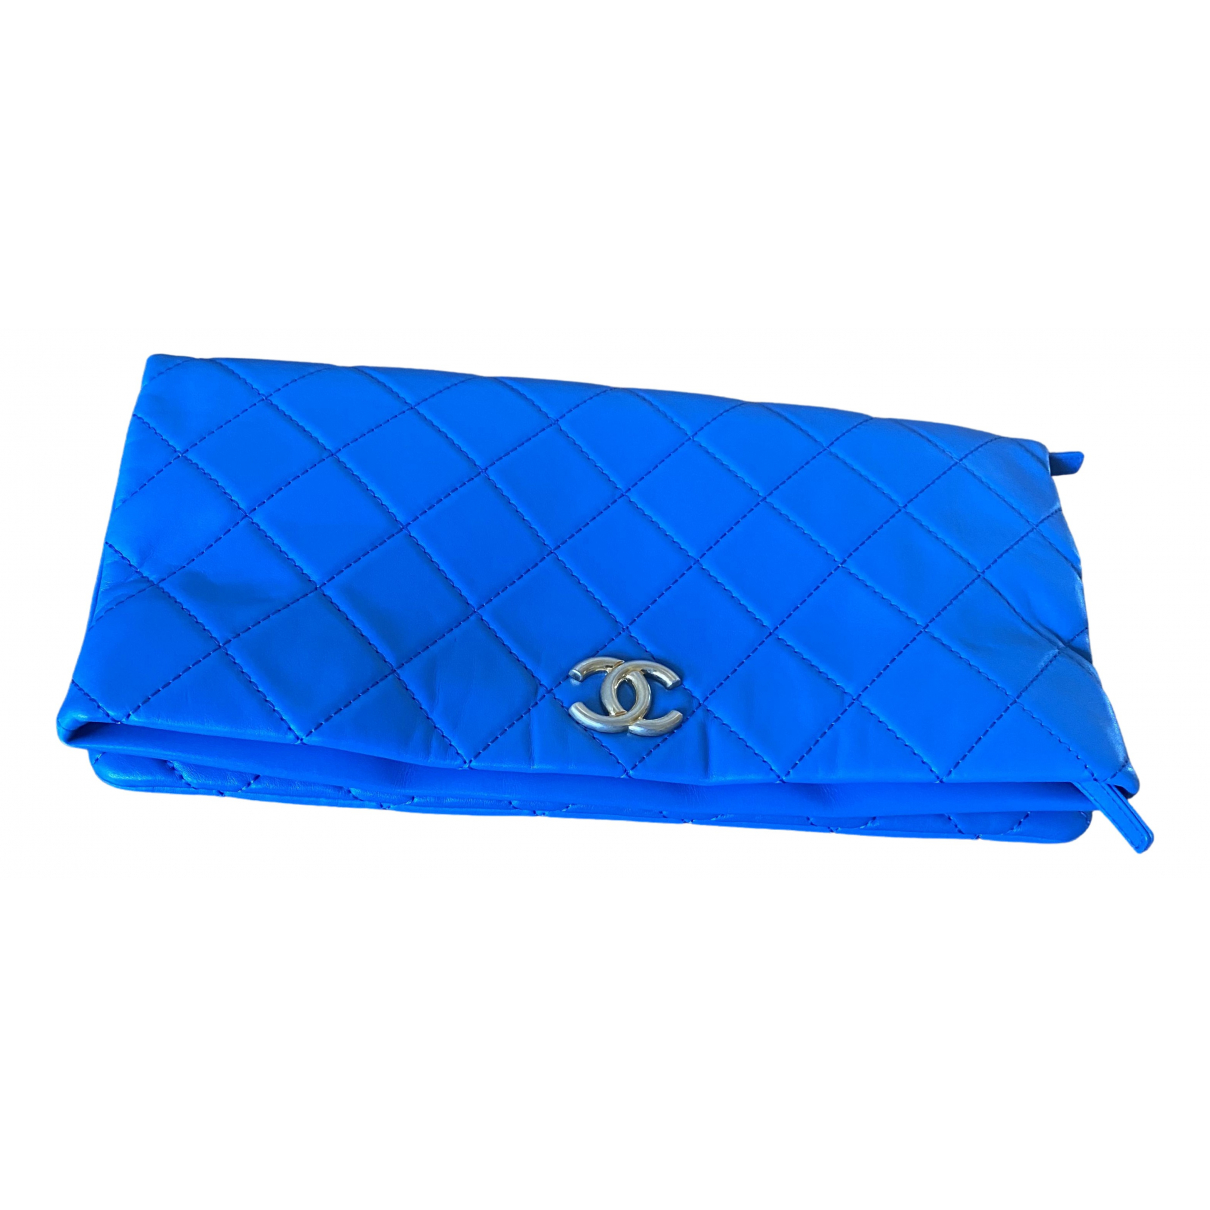 Chanel N Blue Leather Clutch bag for Women N